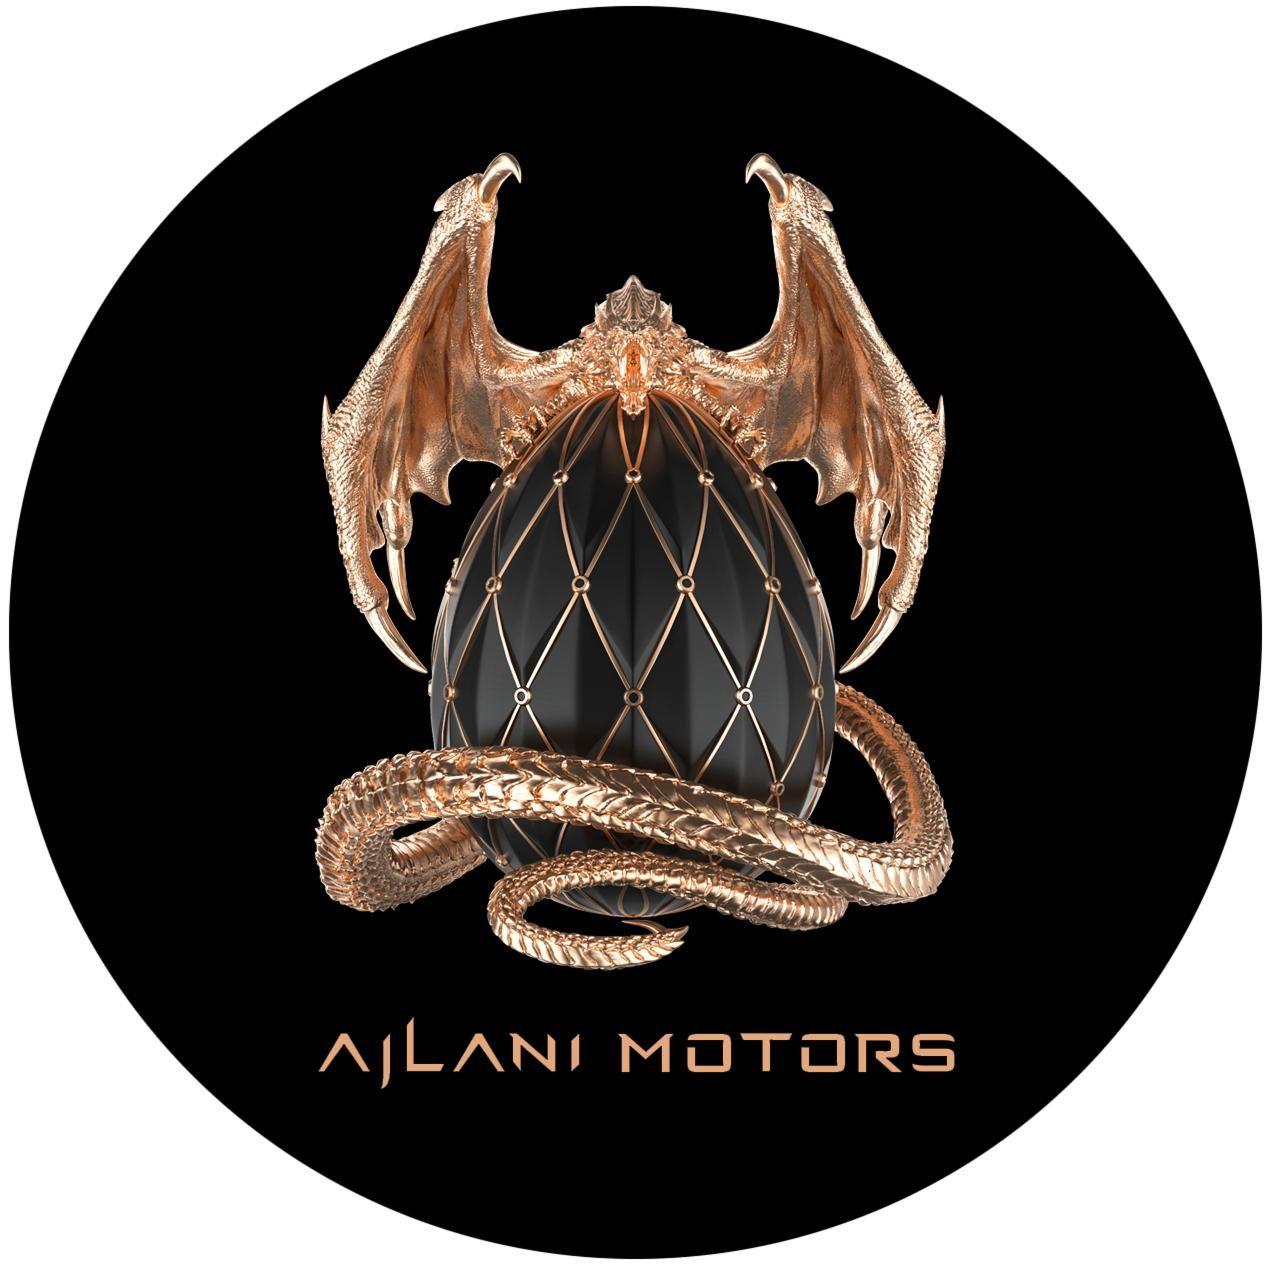 AJLANI MOTORS